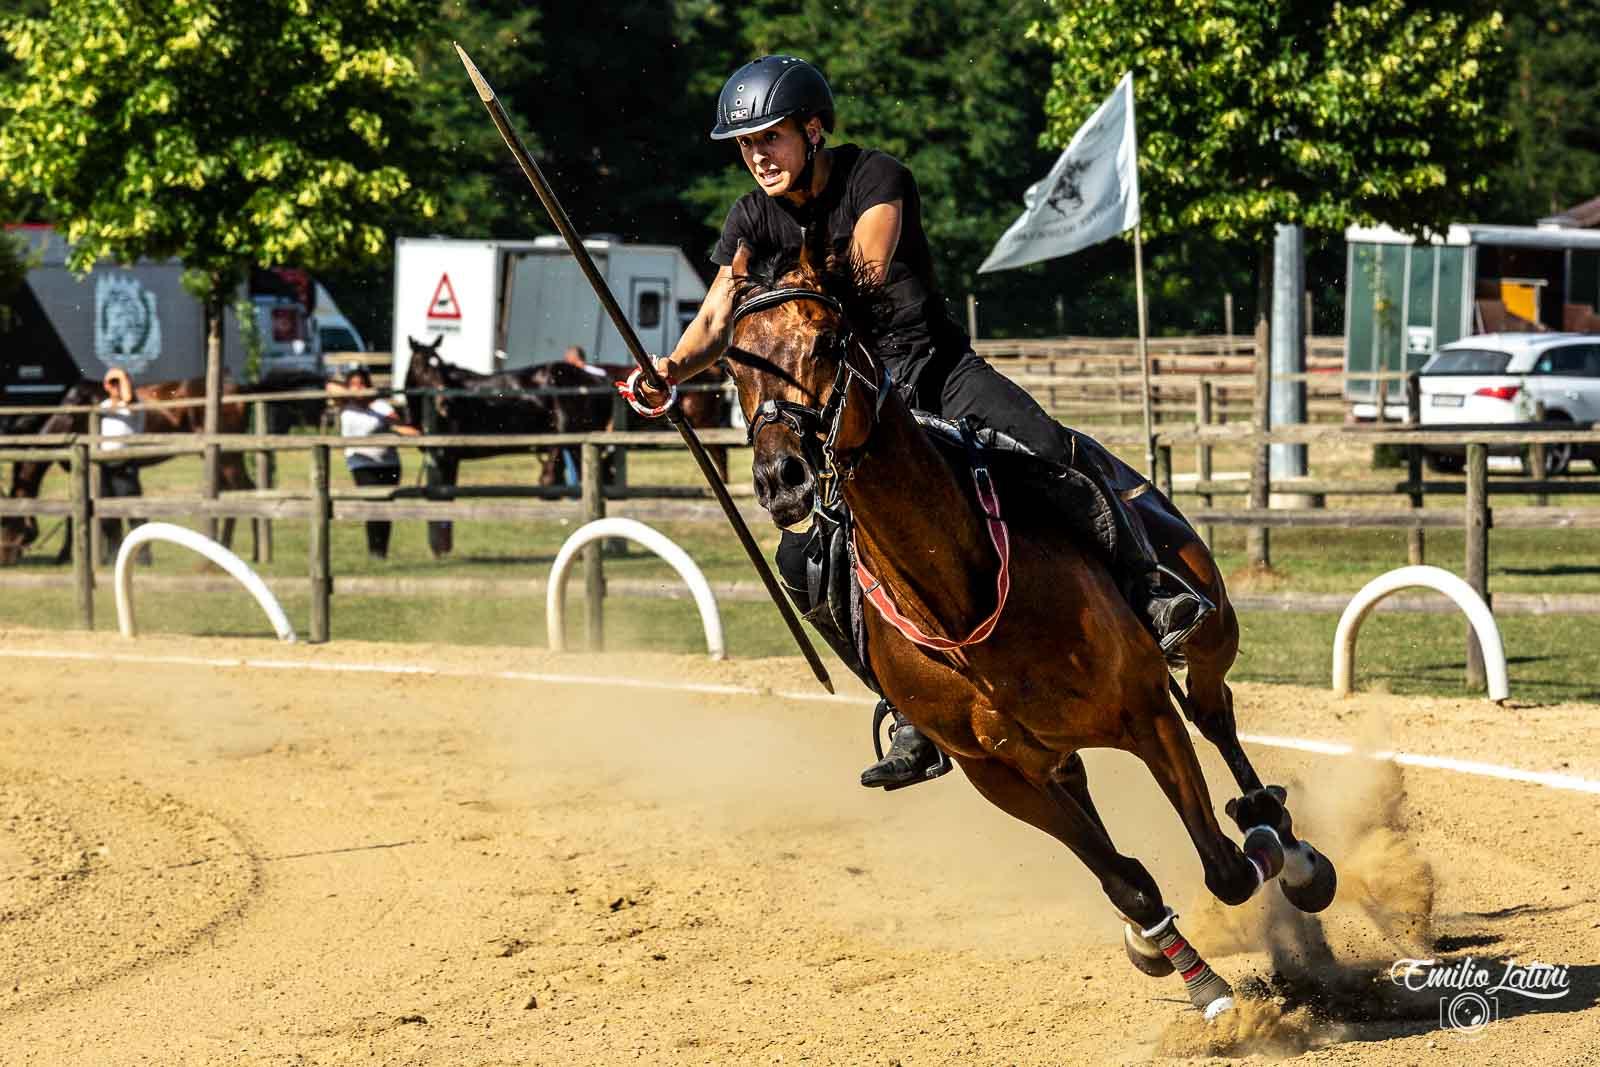 A.S.D. Associazione Equestre Vallesina | Quintana Moie | Torneo Giostre Medioevali 2018